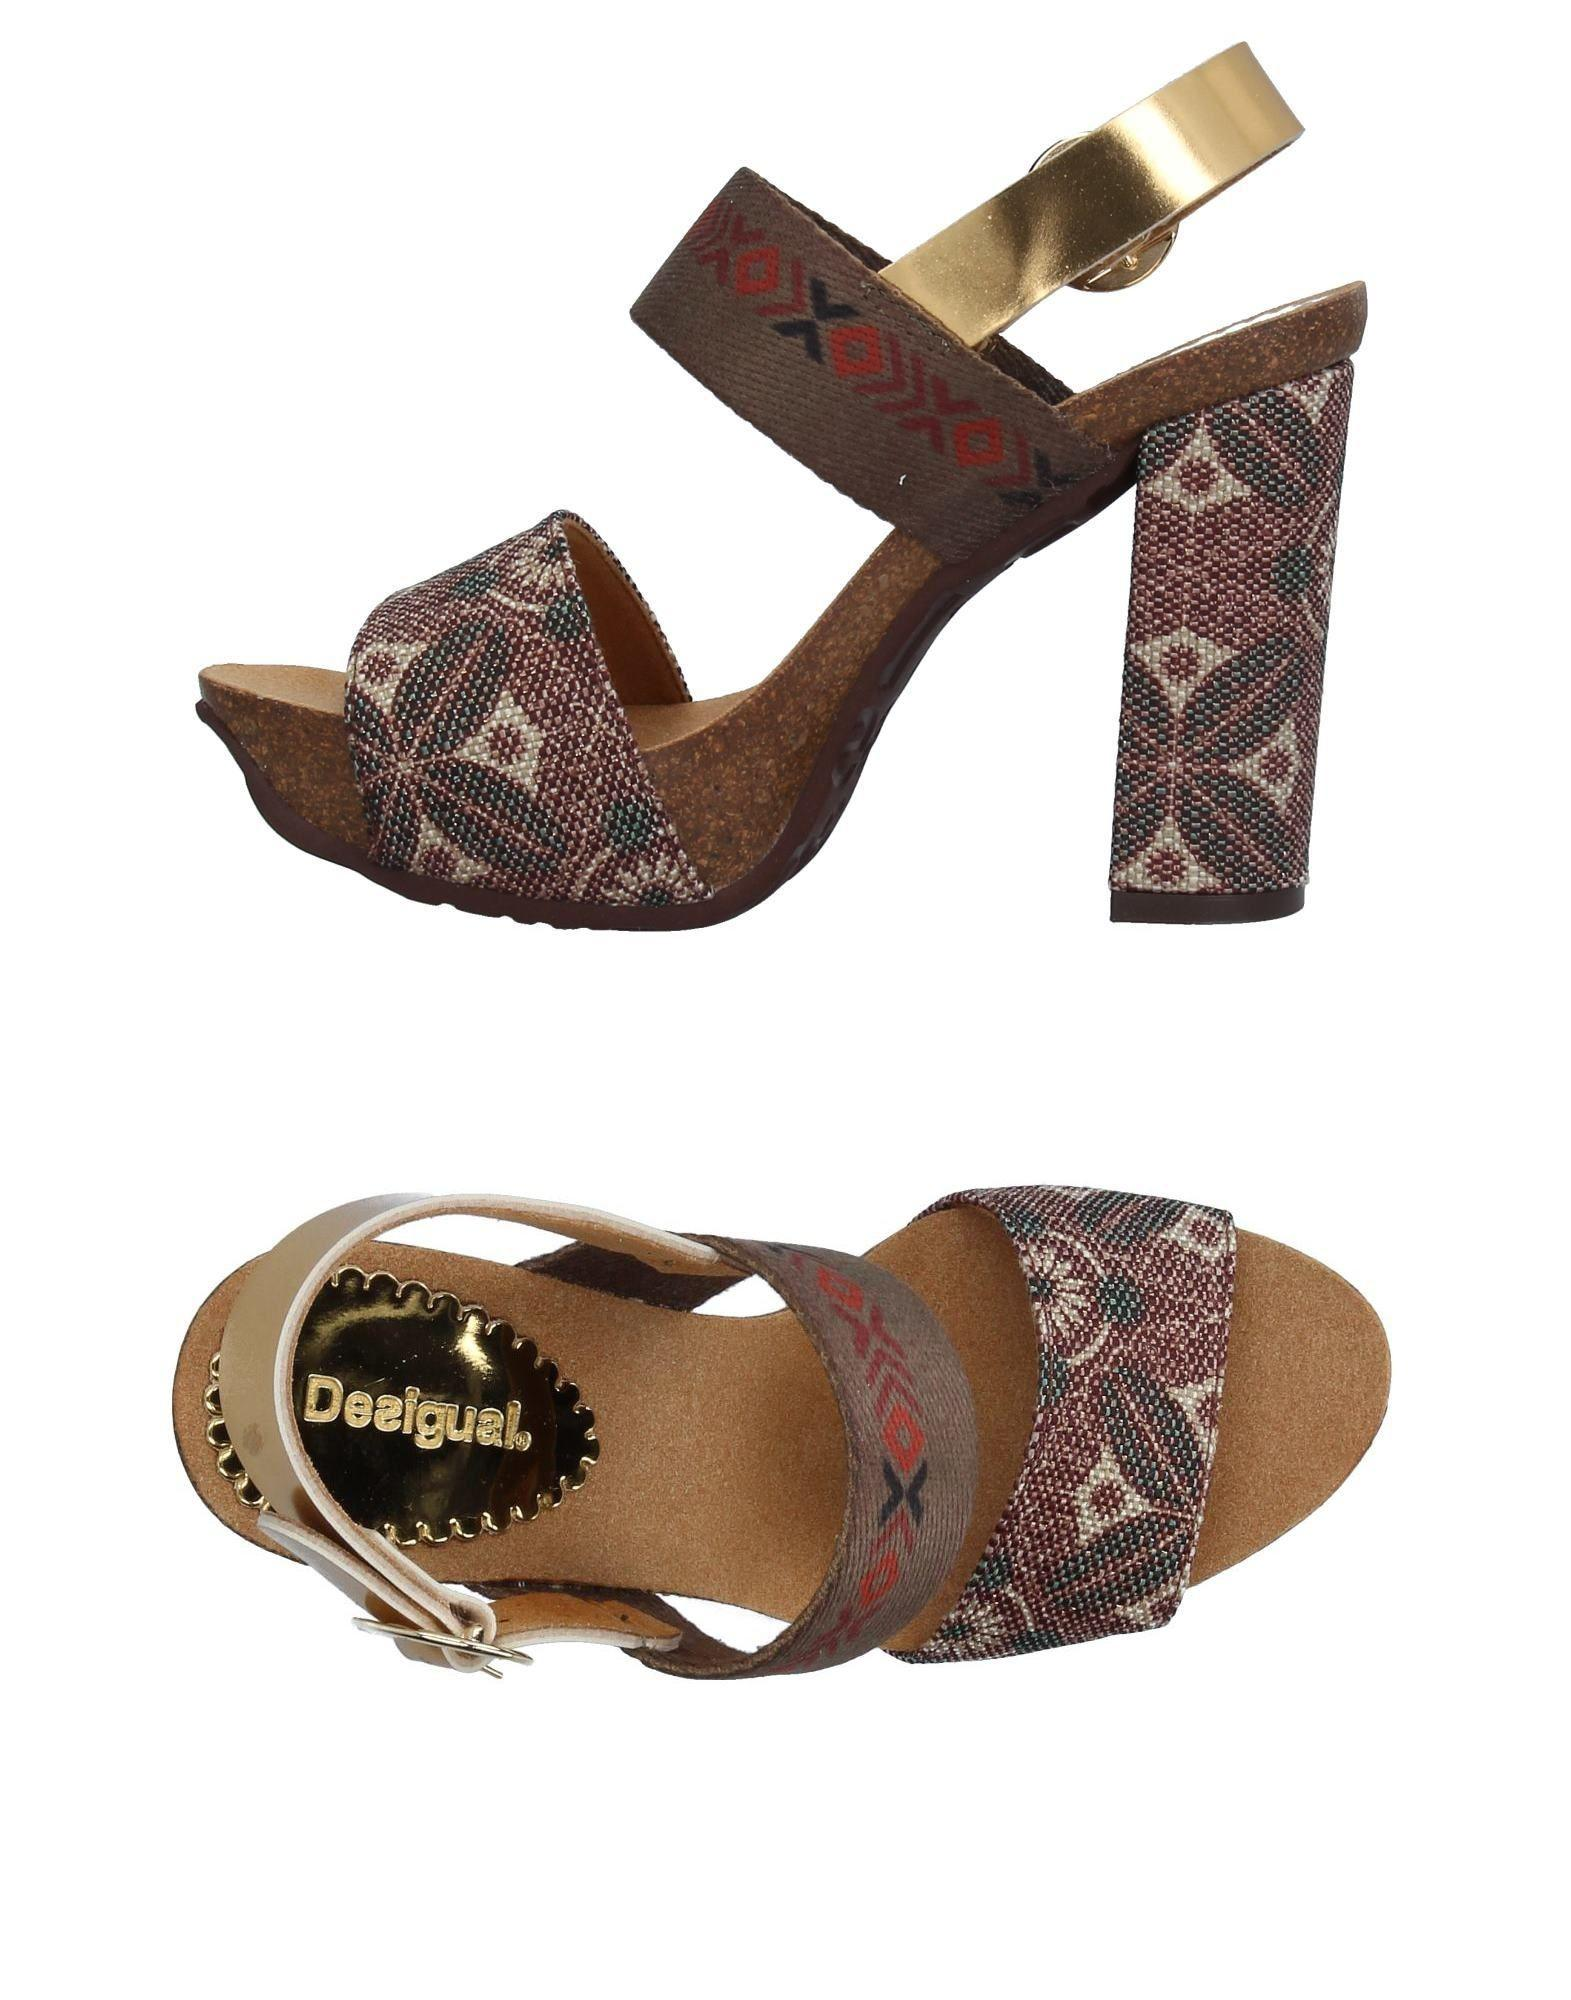 Desigual Brown In Sandals Lyst Mpgquvzs 0kXZNwO8nP